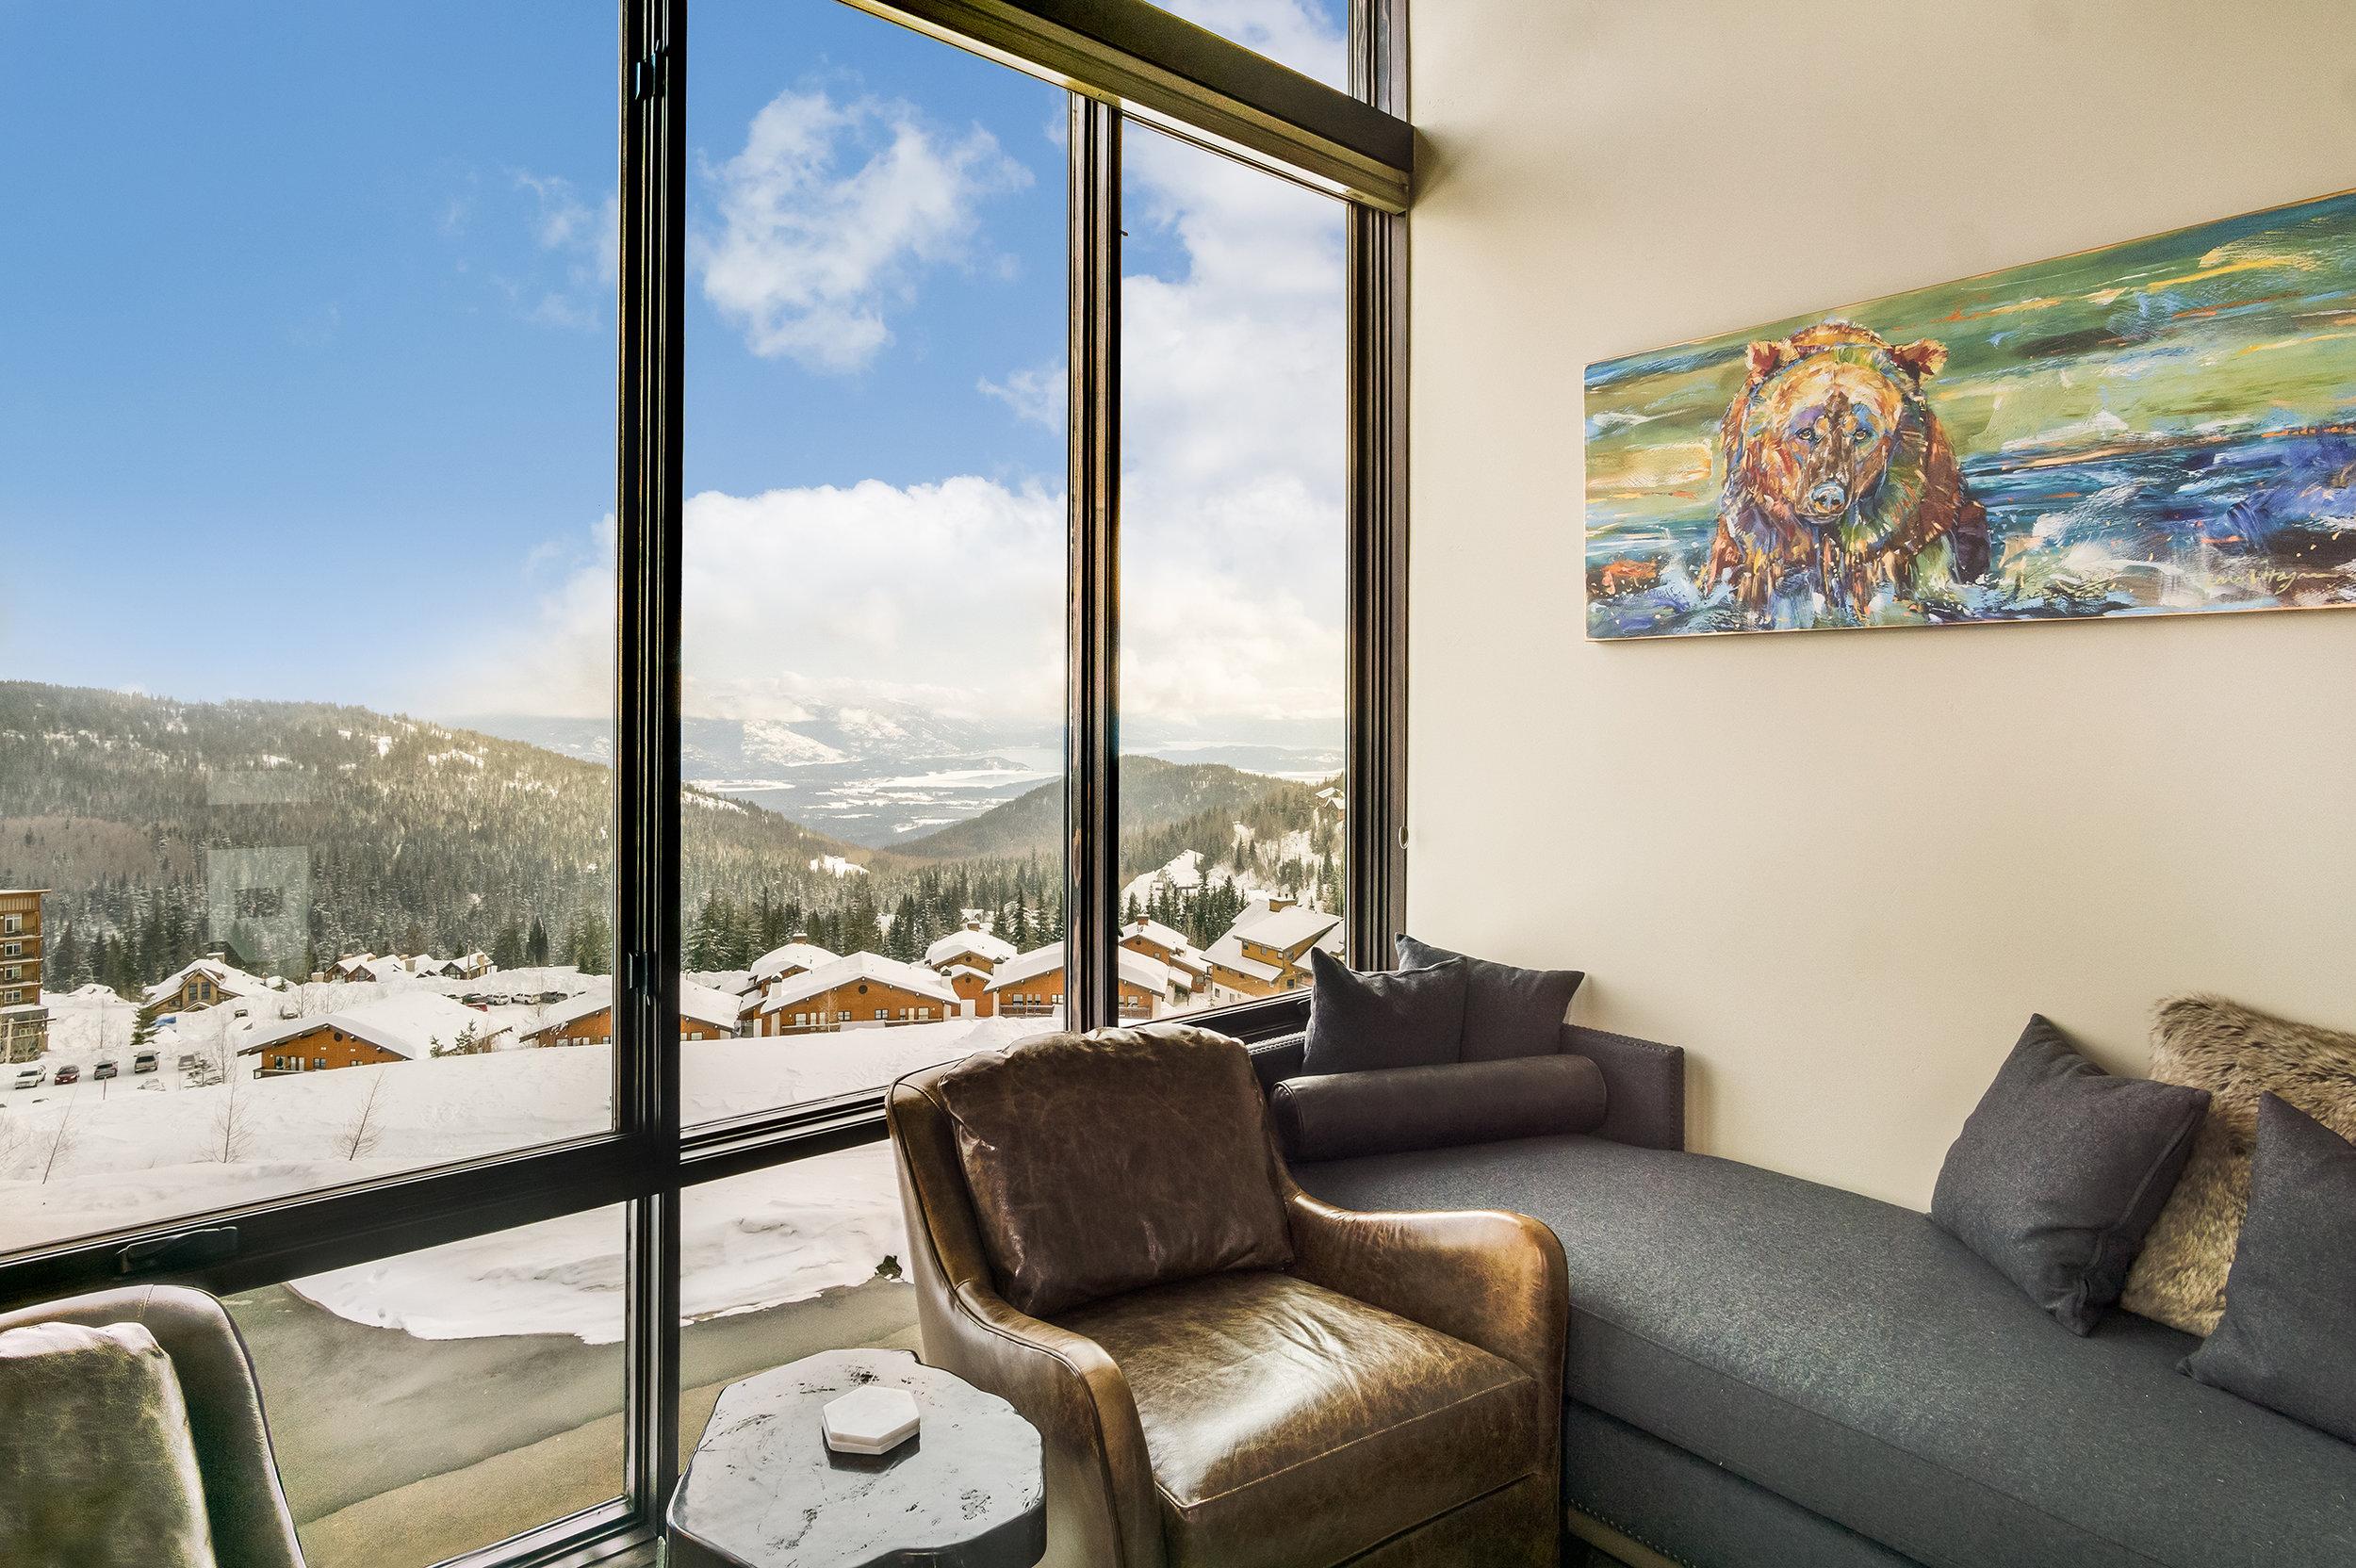 Headwall-Interiors-Windows-View-Mountain.jpg